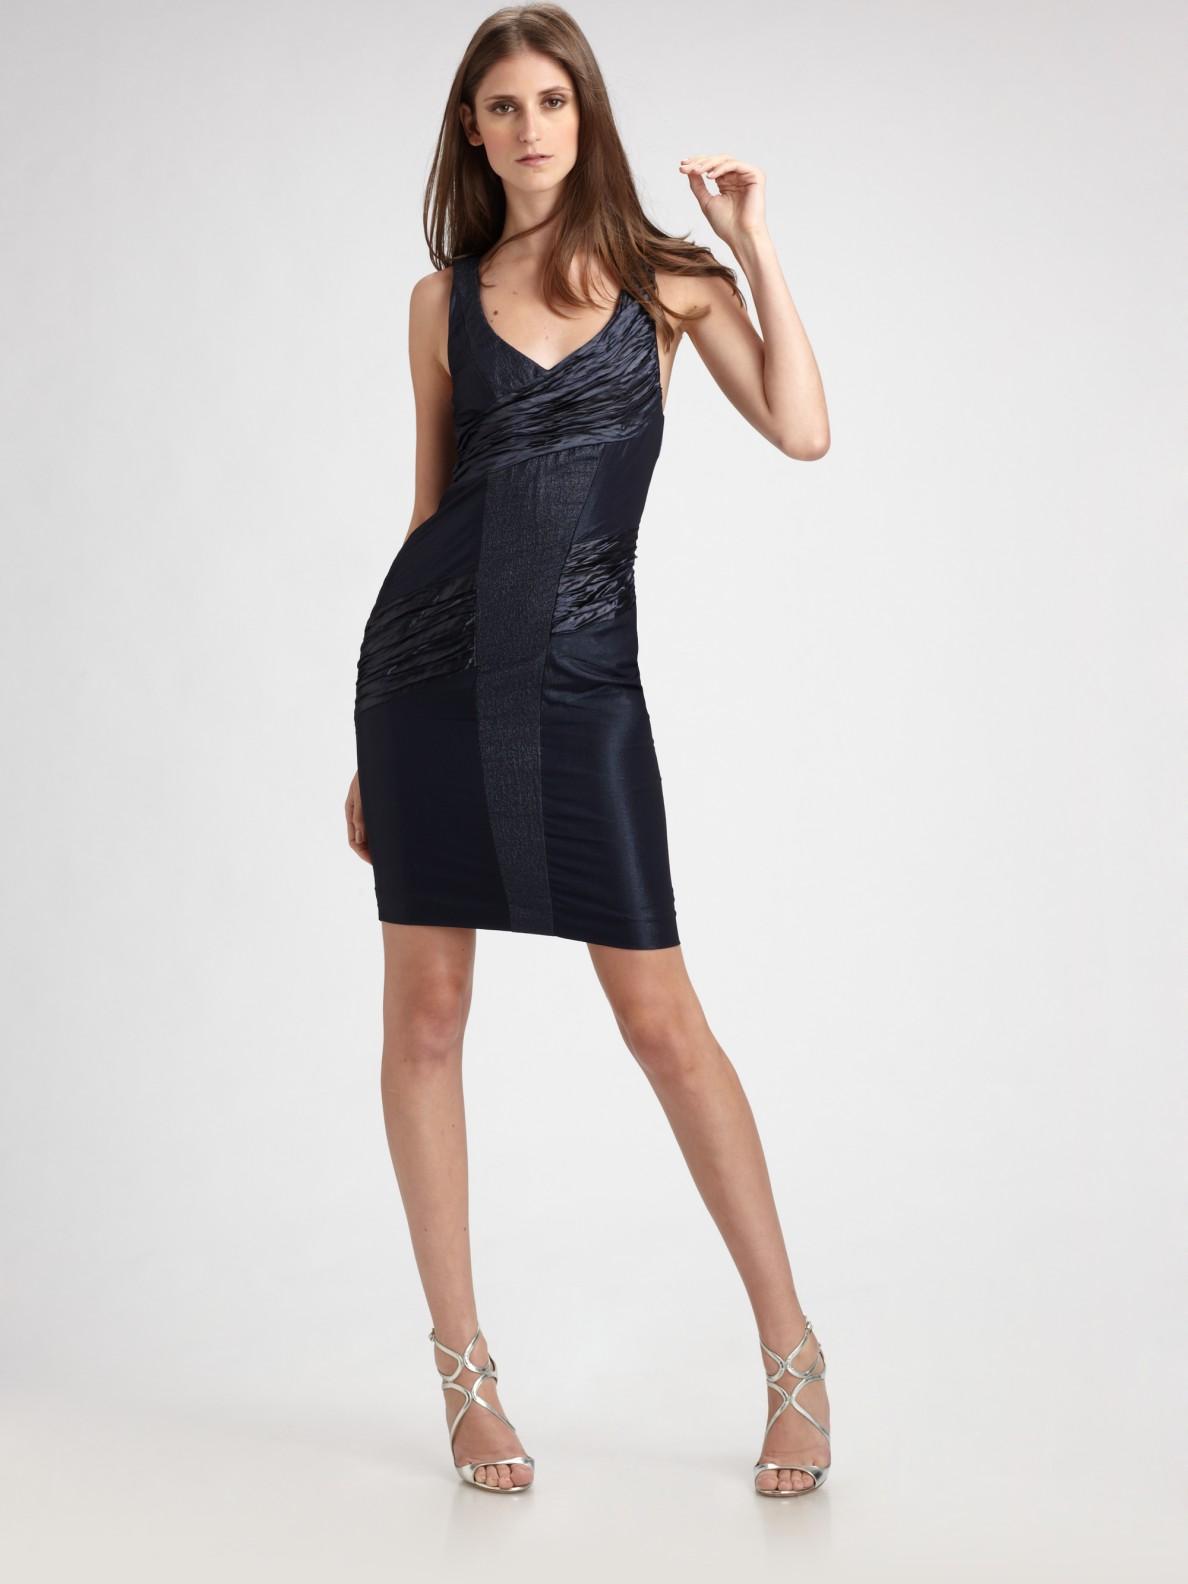 Nicole Miller Evening Dress